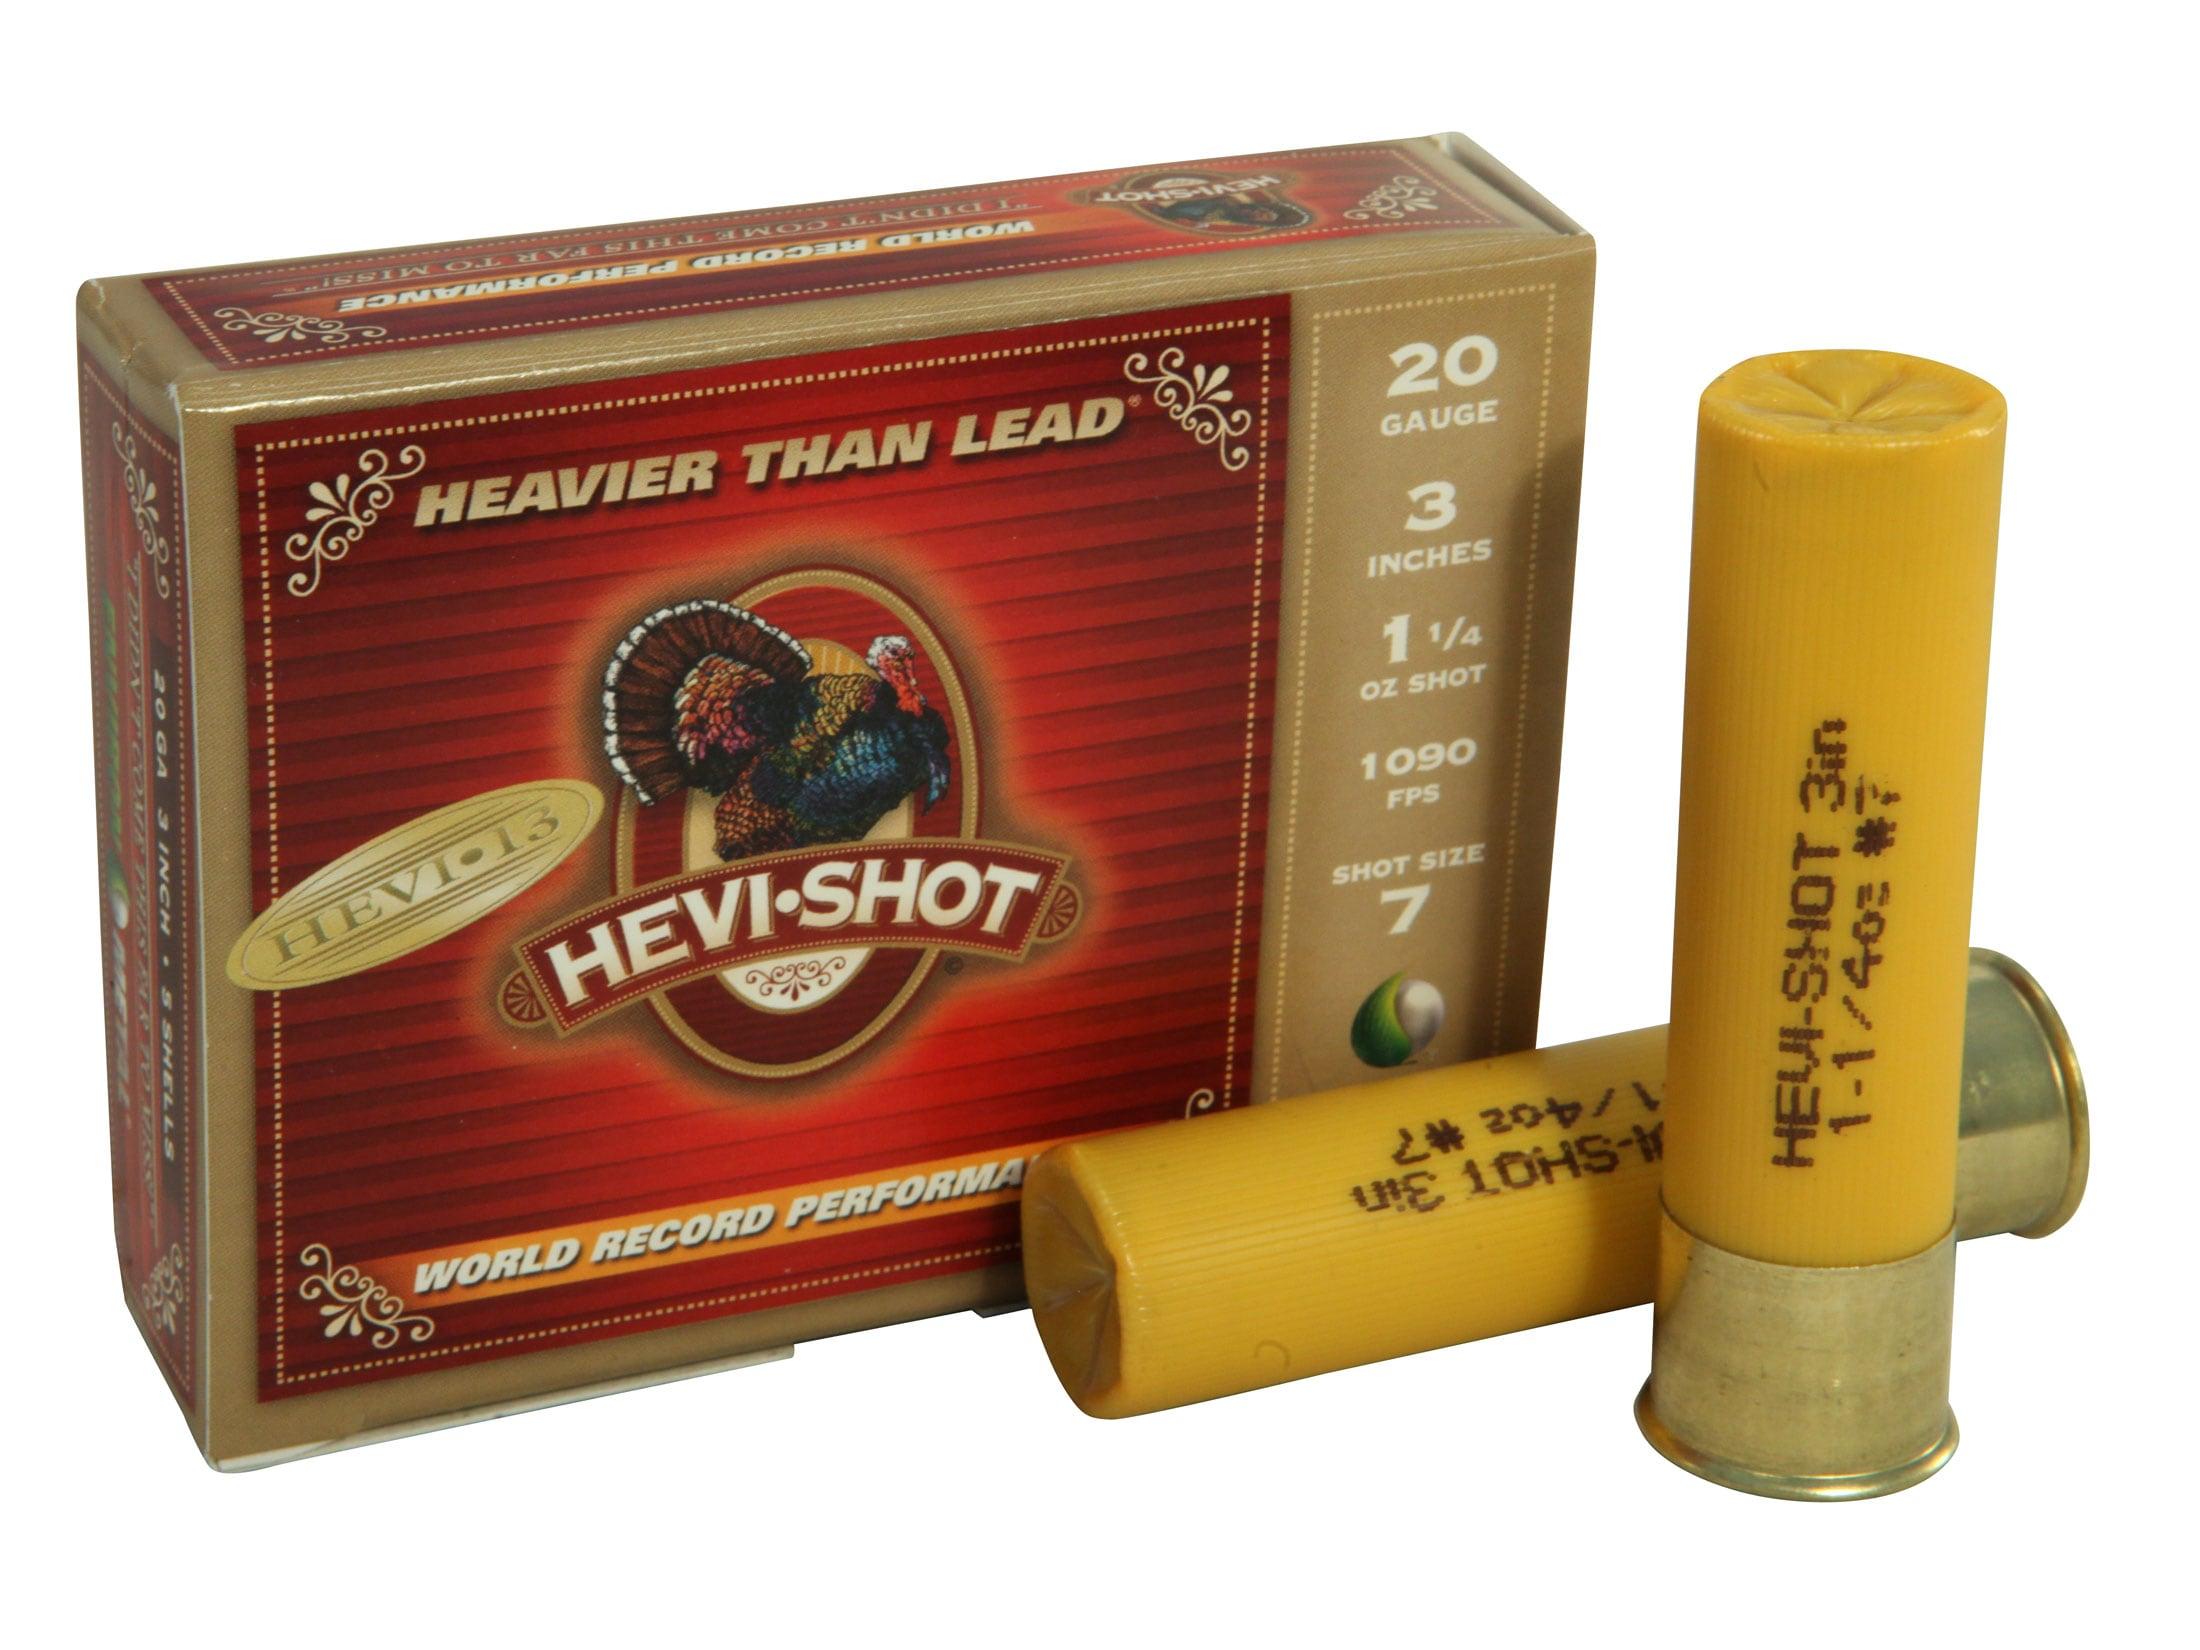 Hevi-Shot Hevi-13 Turkey Ammo 20 Ga 3 1-1/4oz #7 Hevi-Shot Non-Toxic